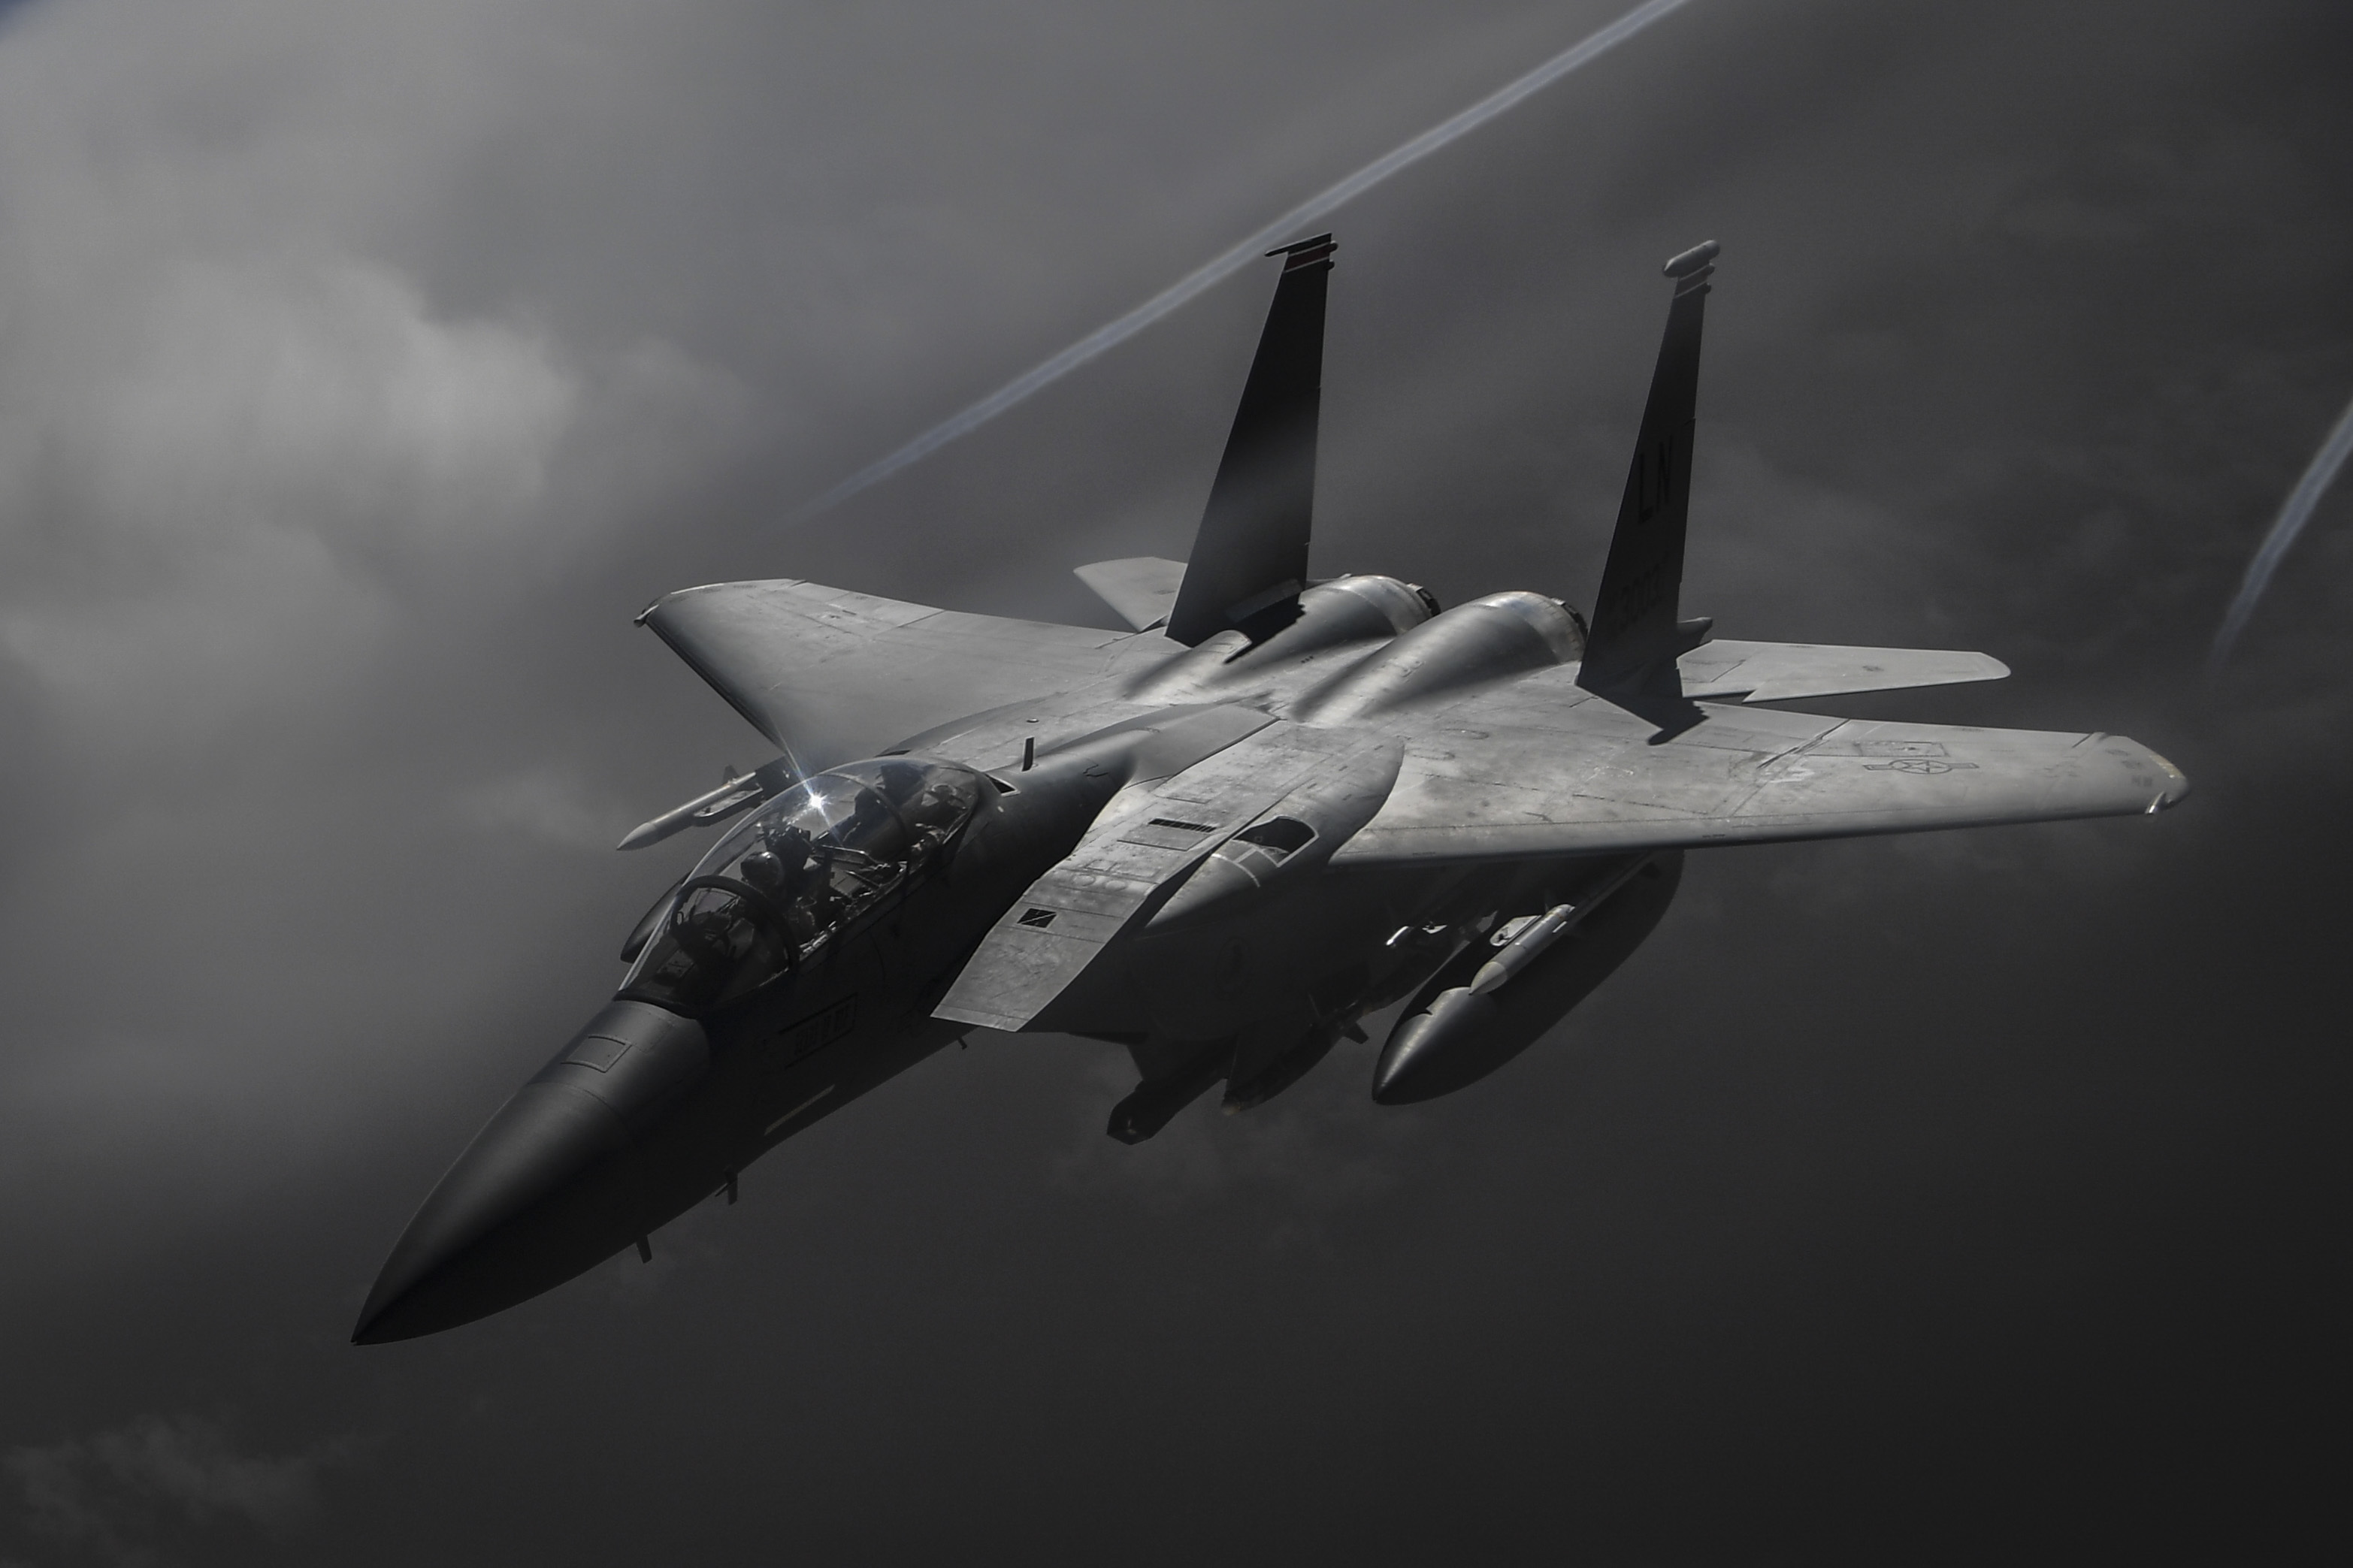 KC-135 refuels F-15s, F-15 facts